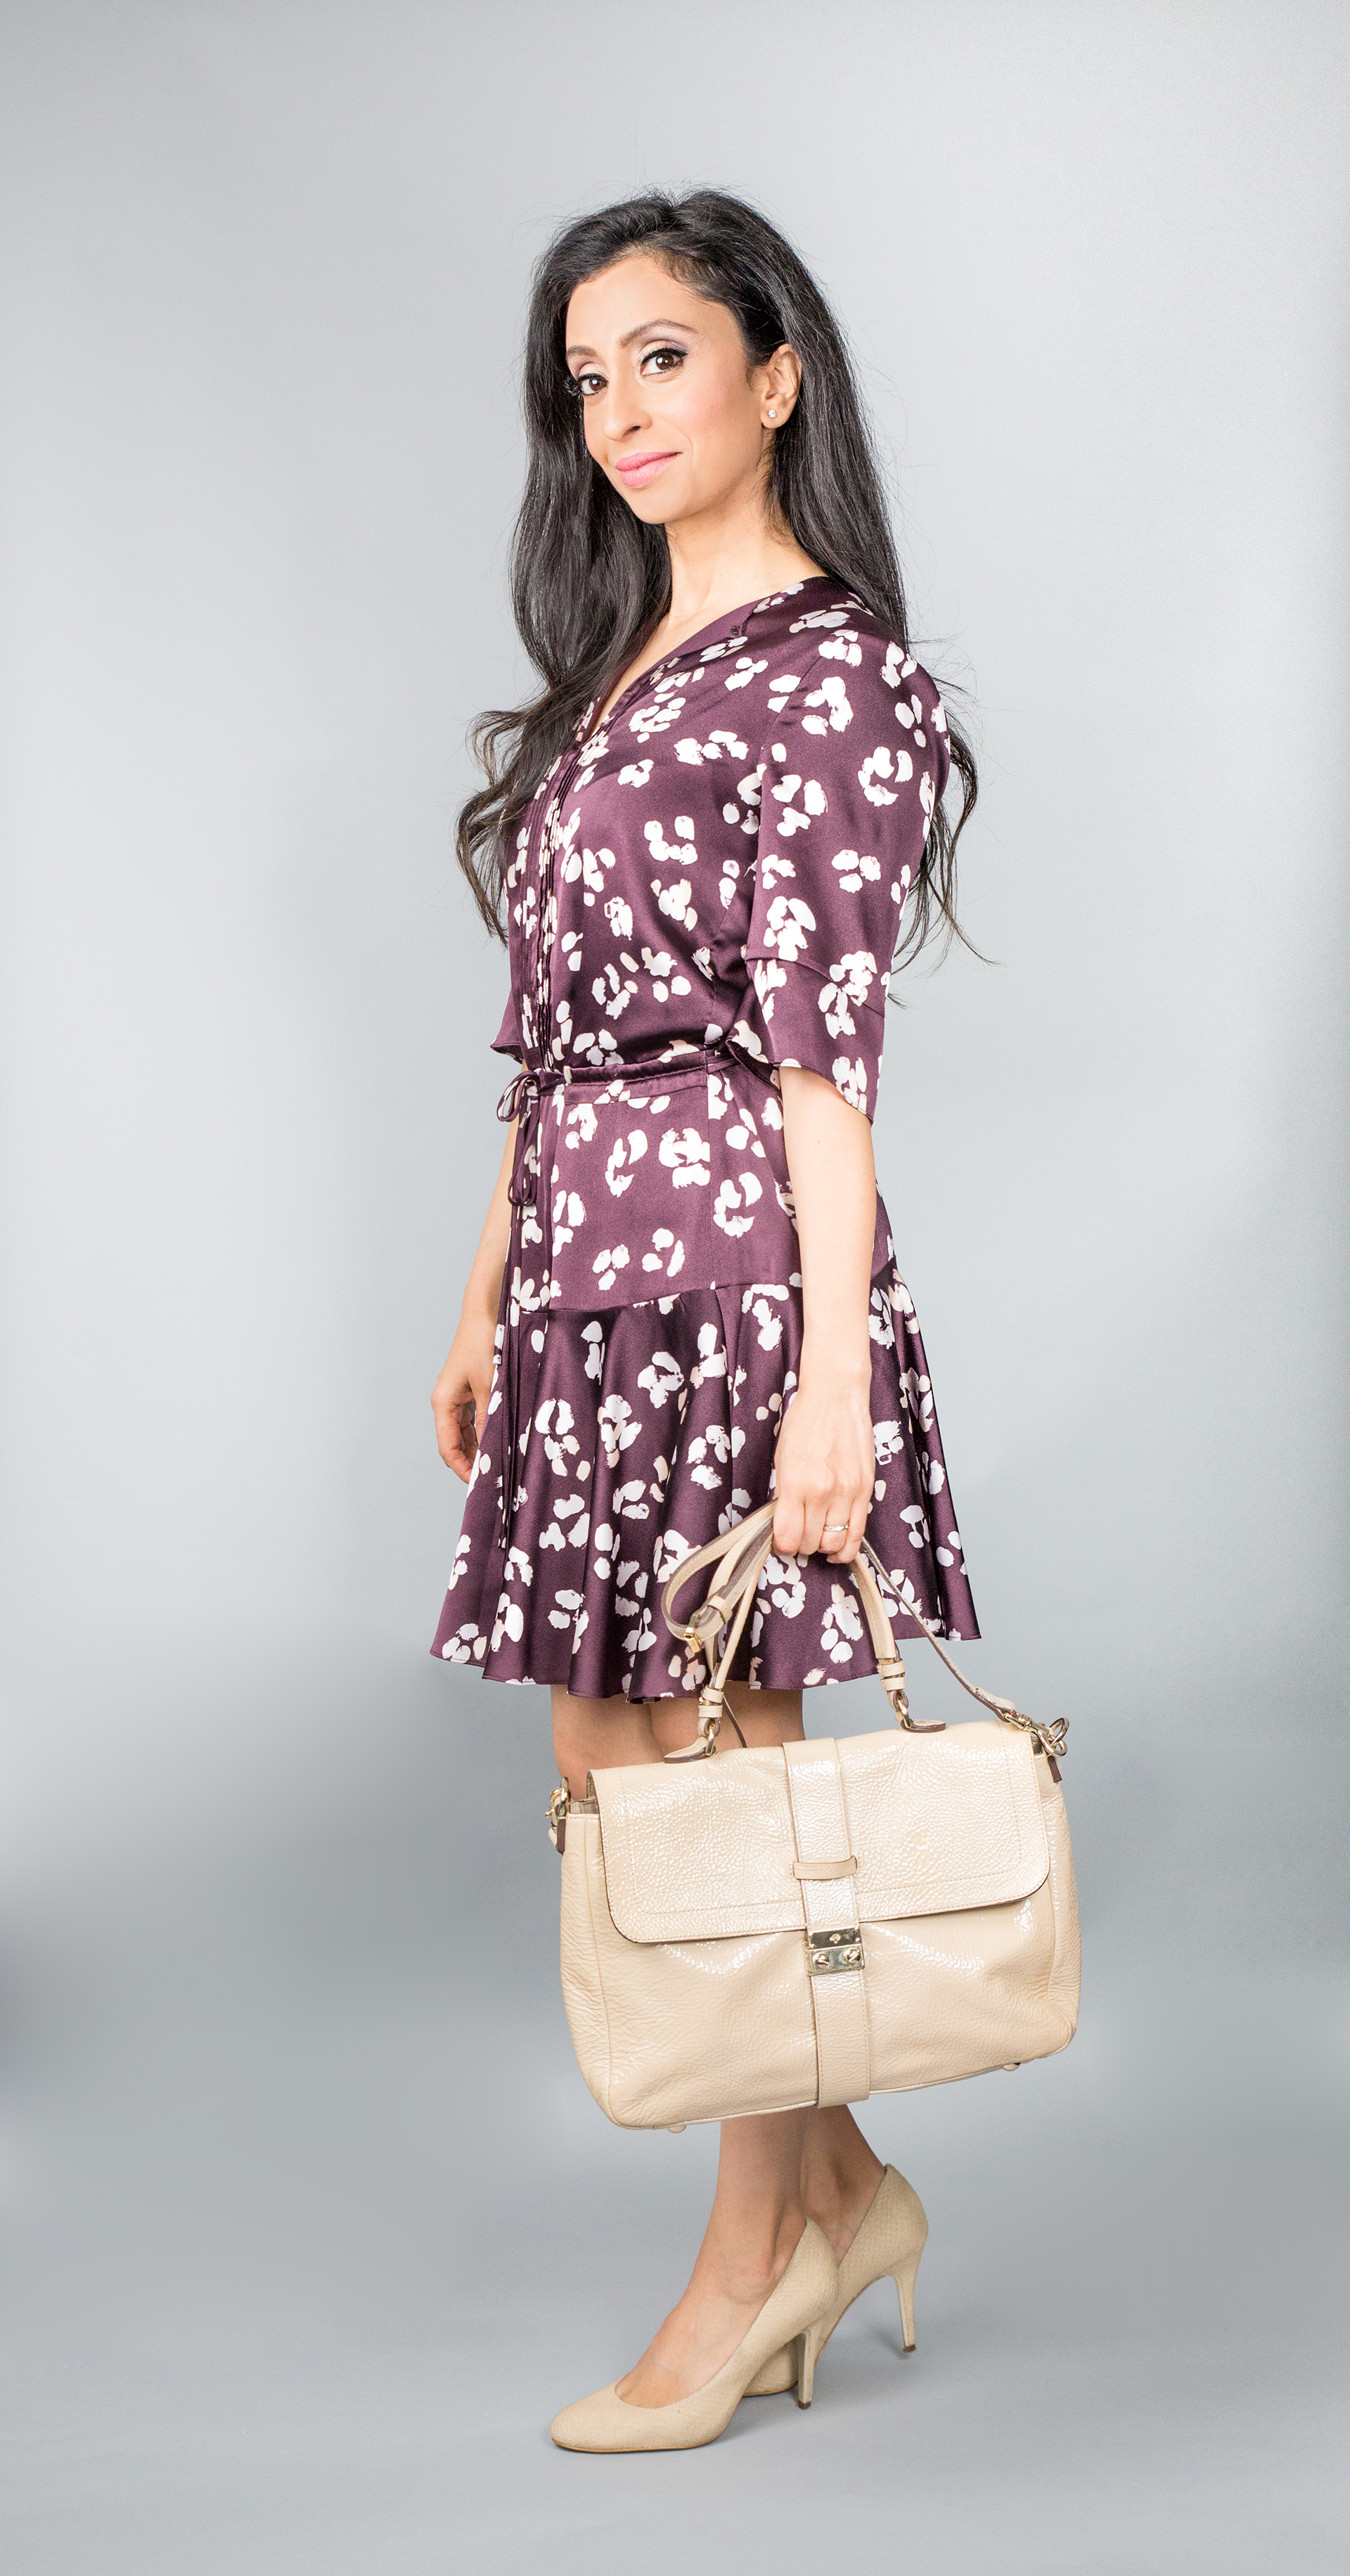 Nadia with handbag with multi-purpose strap